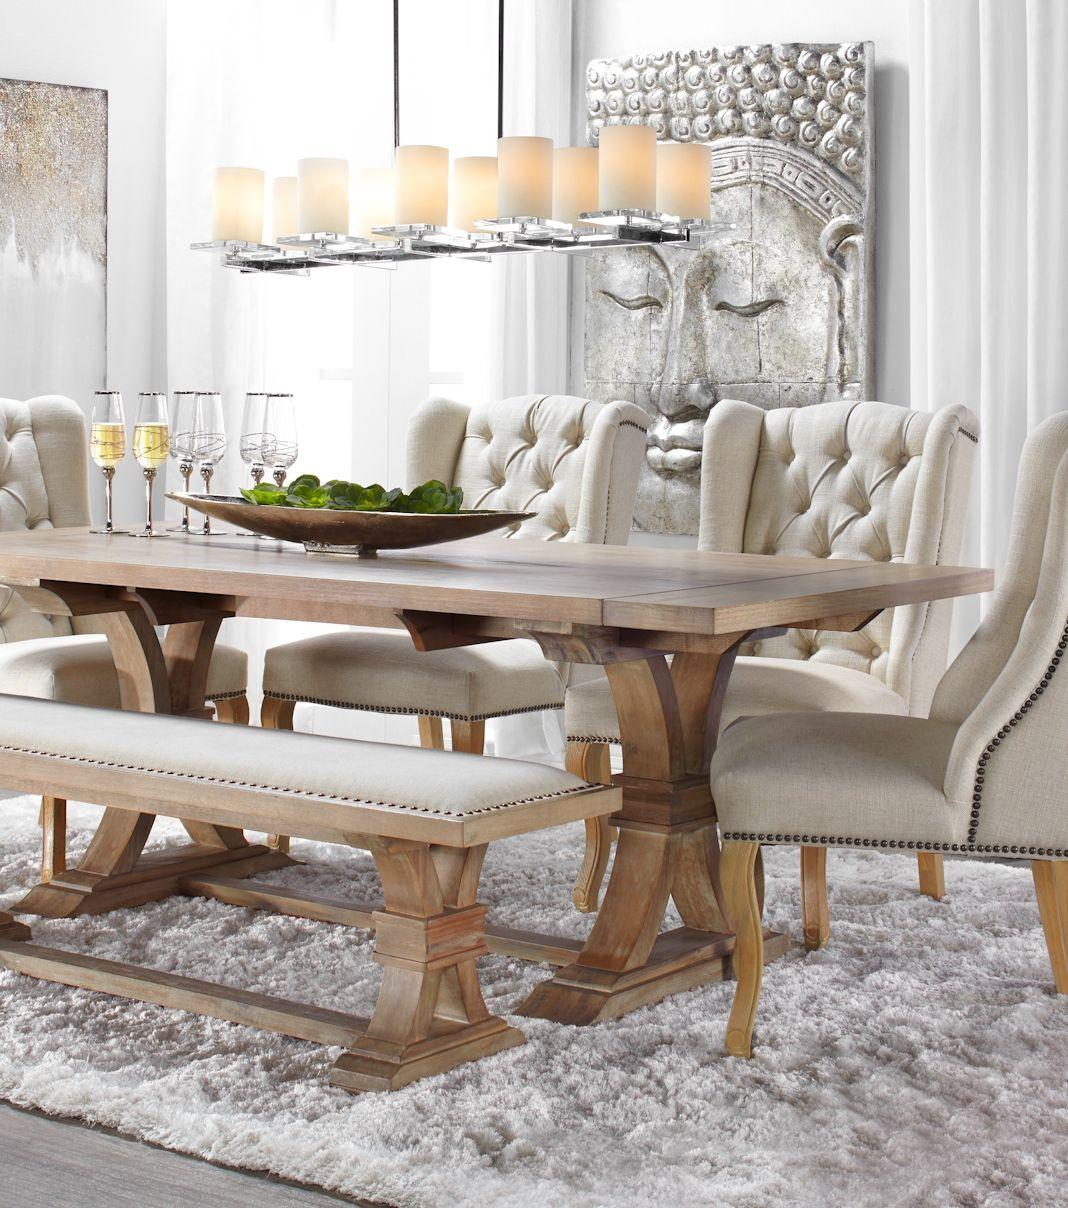 Inspiration for your next summer celebration home furniture